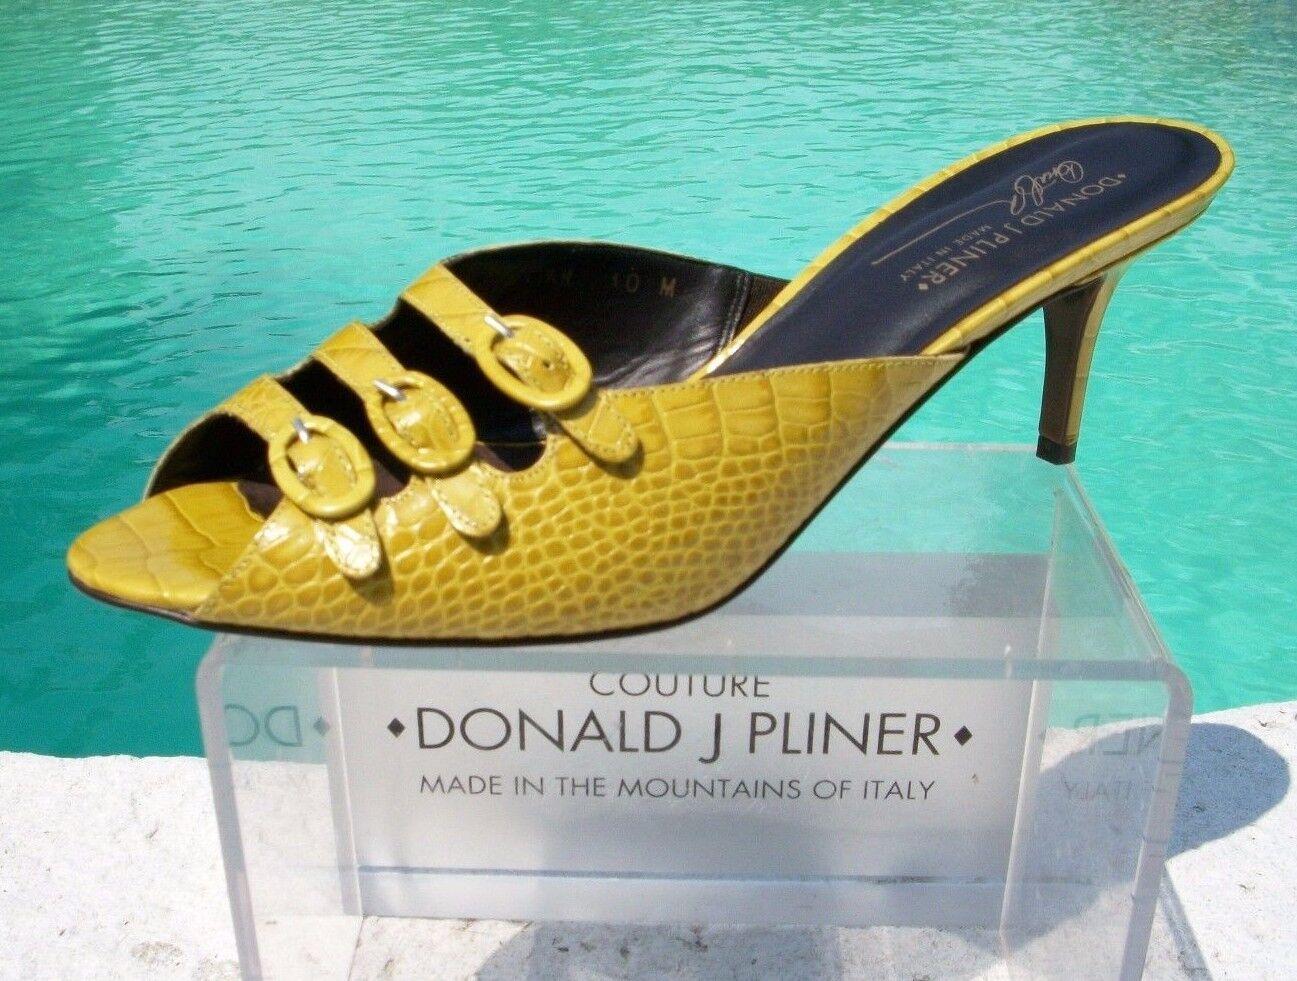 Donald Pliner Couture Gator Leather Shoe New 5.5 Sandal 3 Strap Buckles $295 NIB